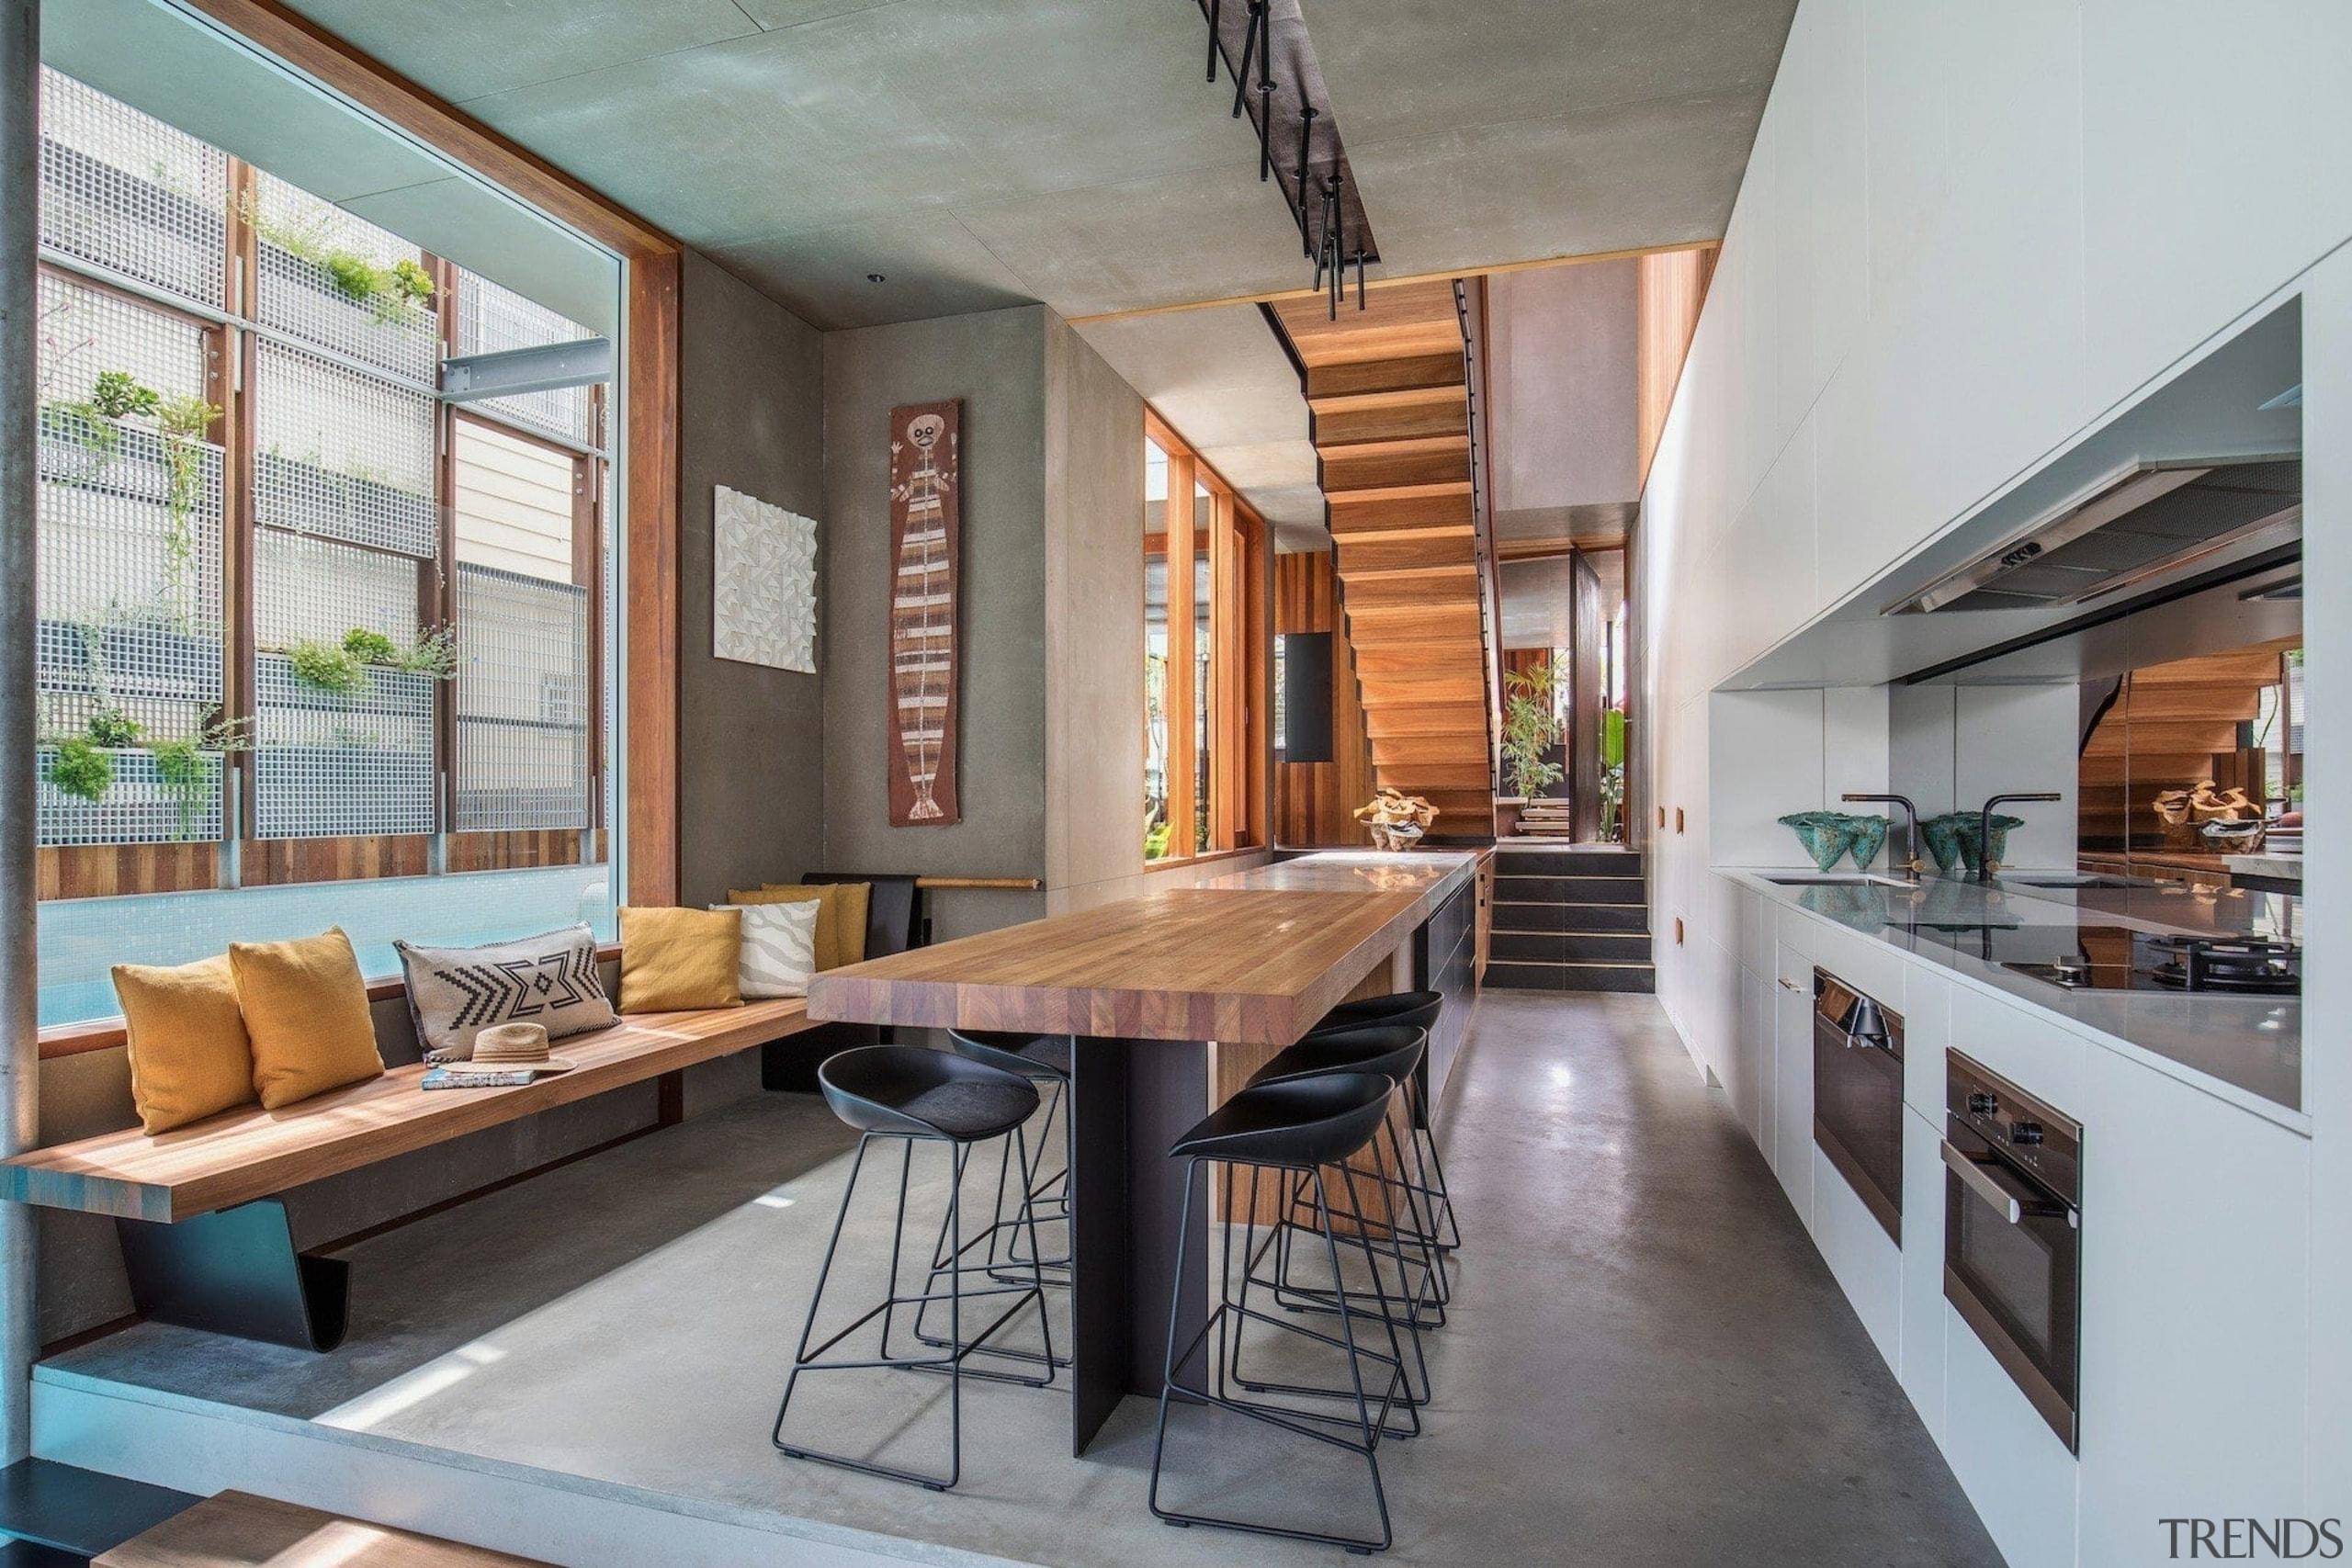 Winner – Cplusc Architectural Workshop - architecture | architecture, house, interior design, living room, loft, real estate, gray